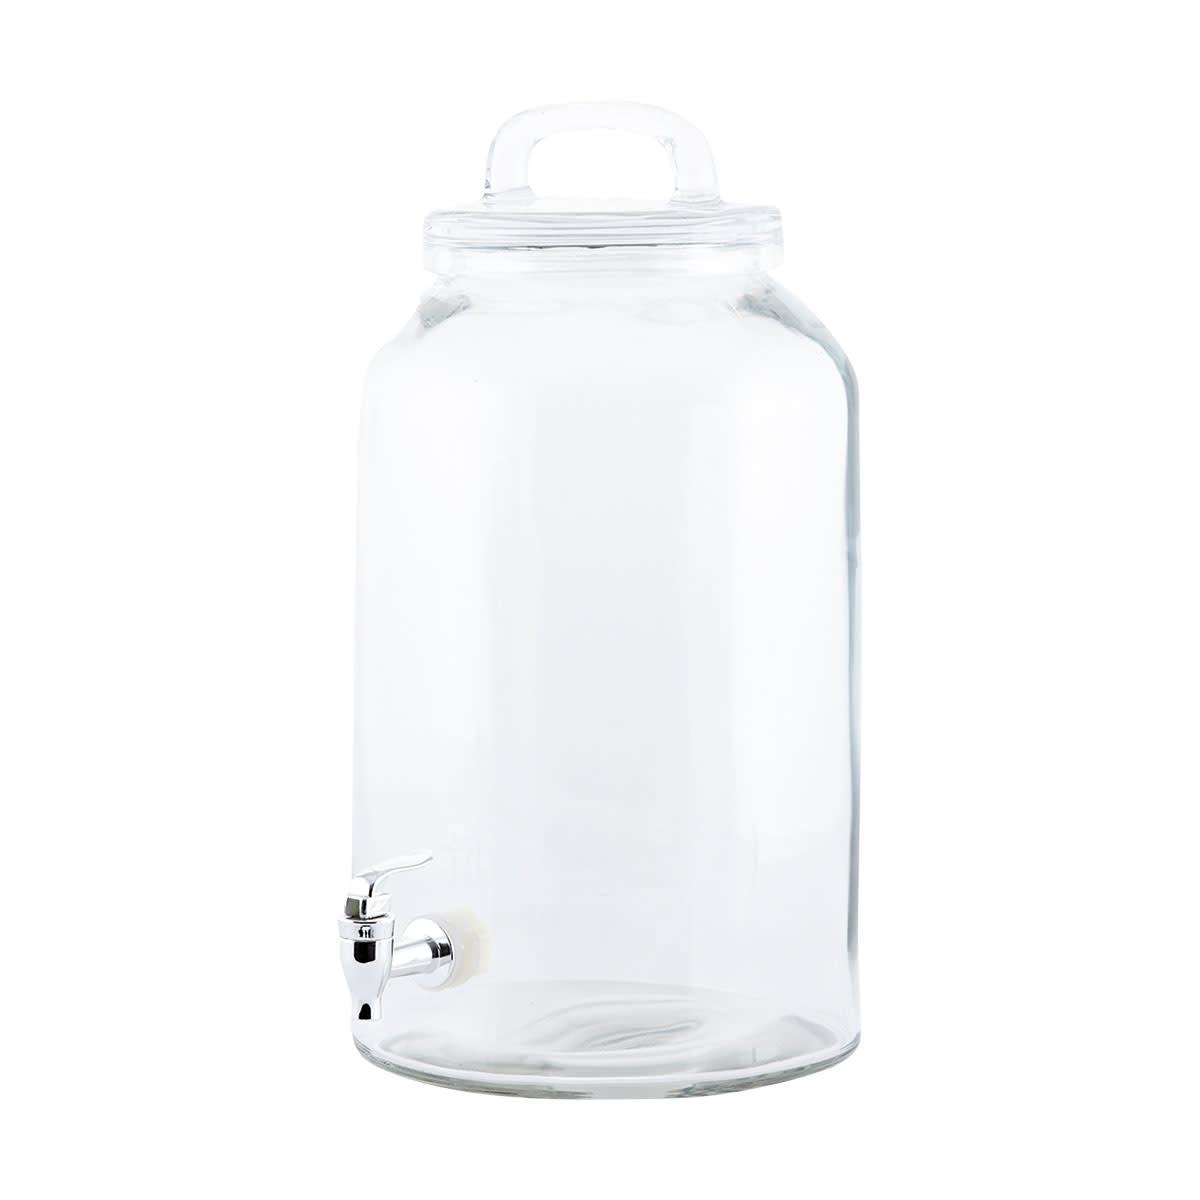 Nicolas Vahé Nicholas Vahe beverage dispenser ice cold 8.5 liter